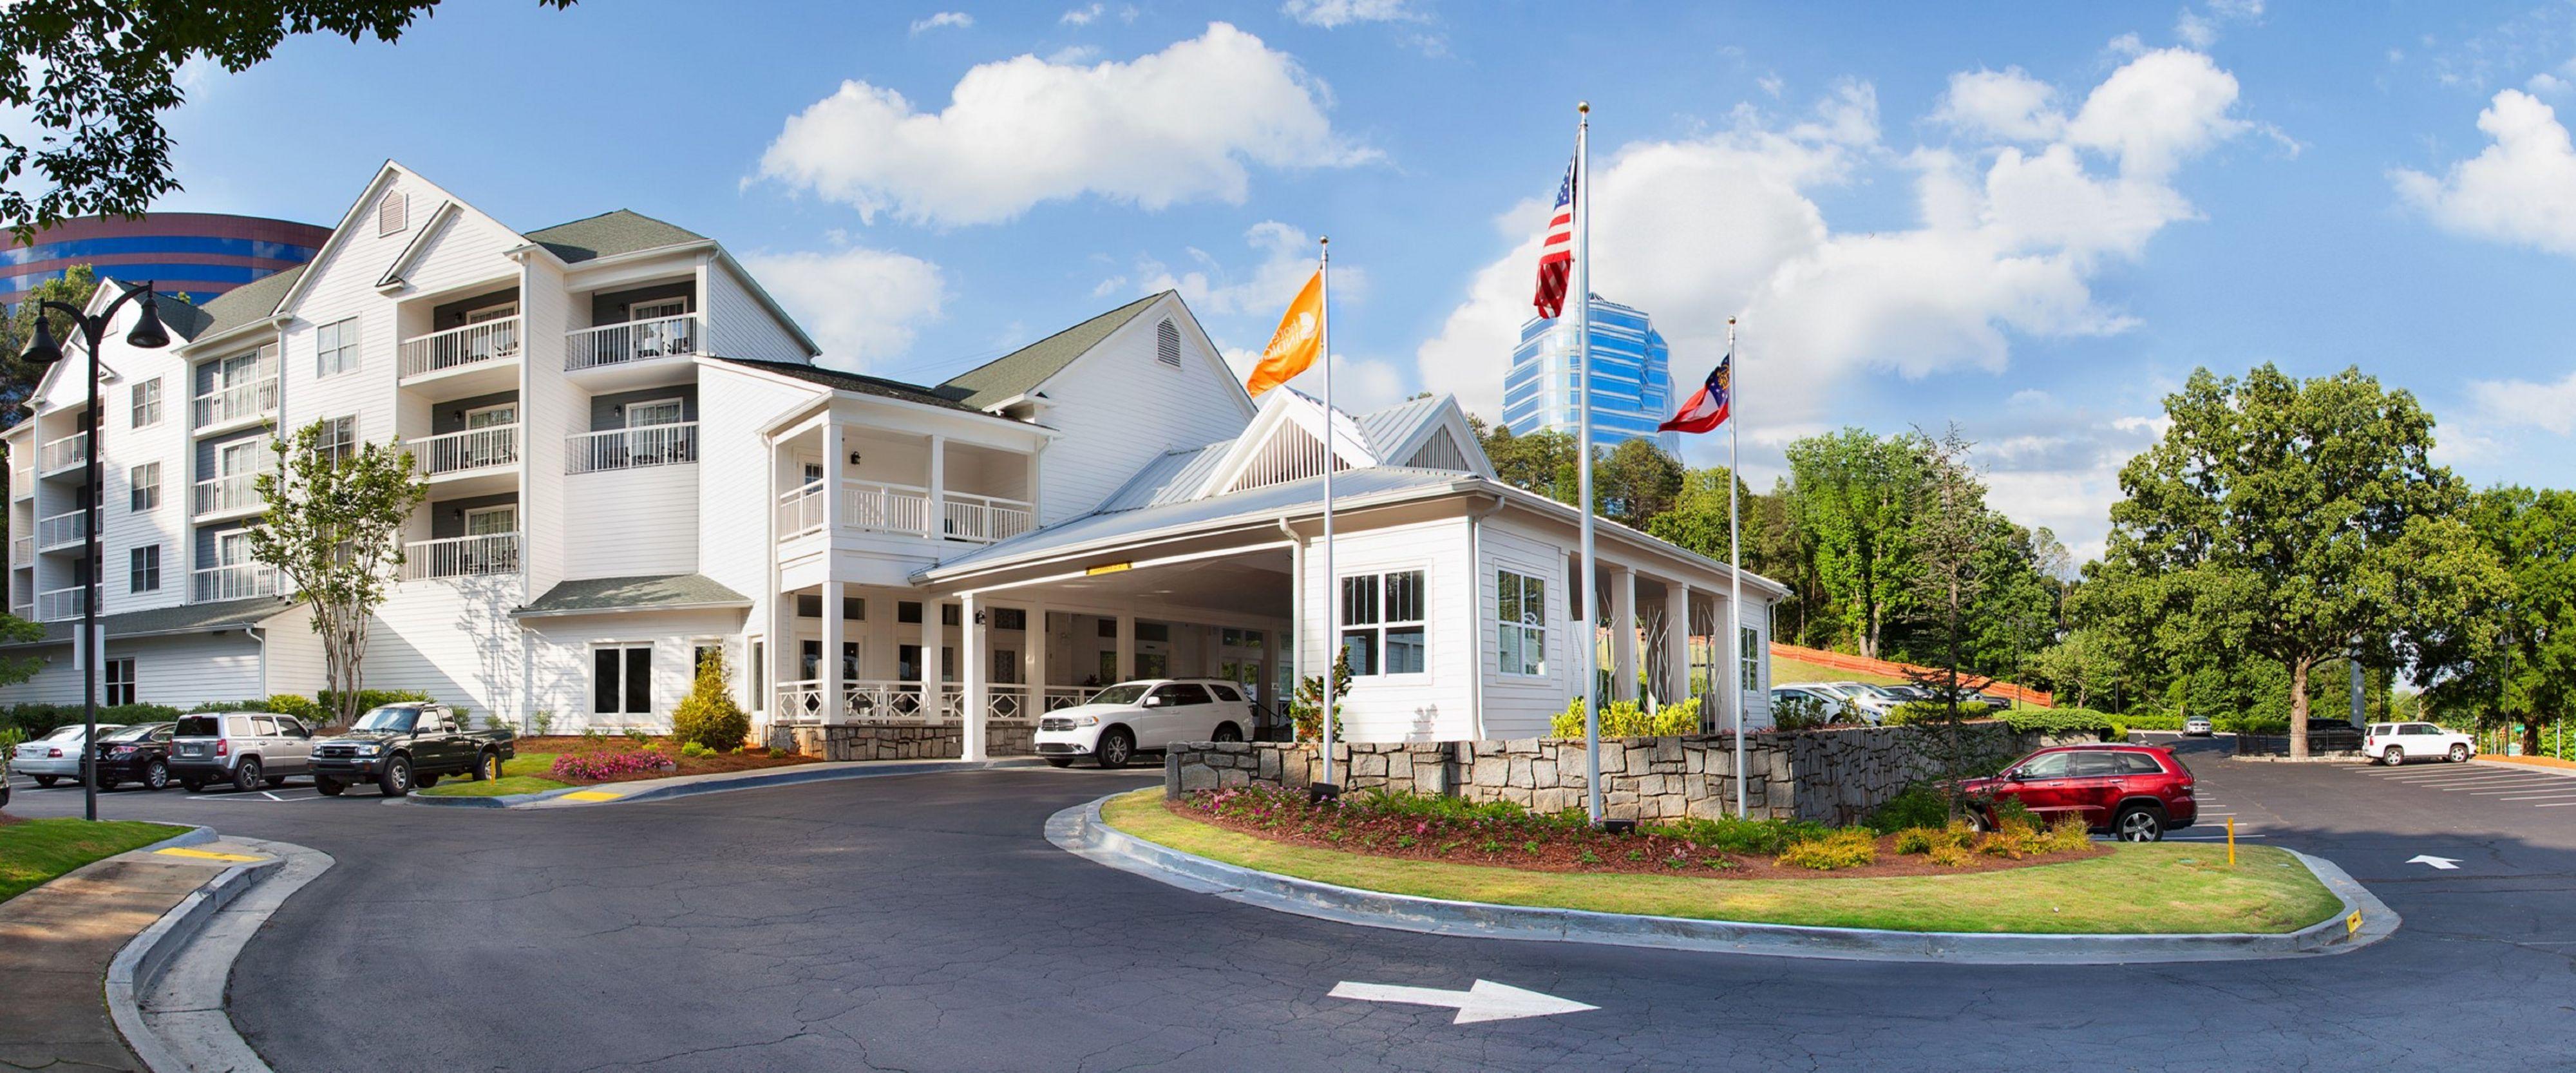 Hotel Indigo Atlanta - Vinings image 0